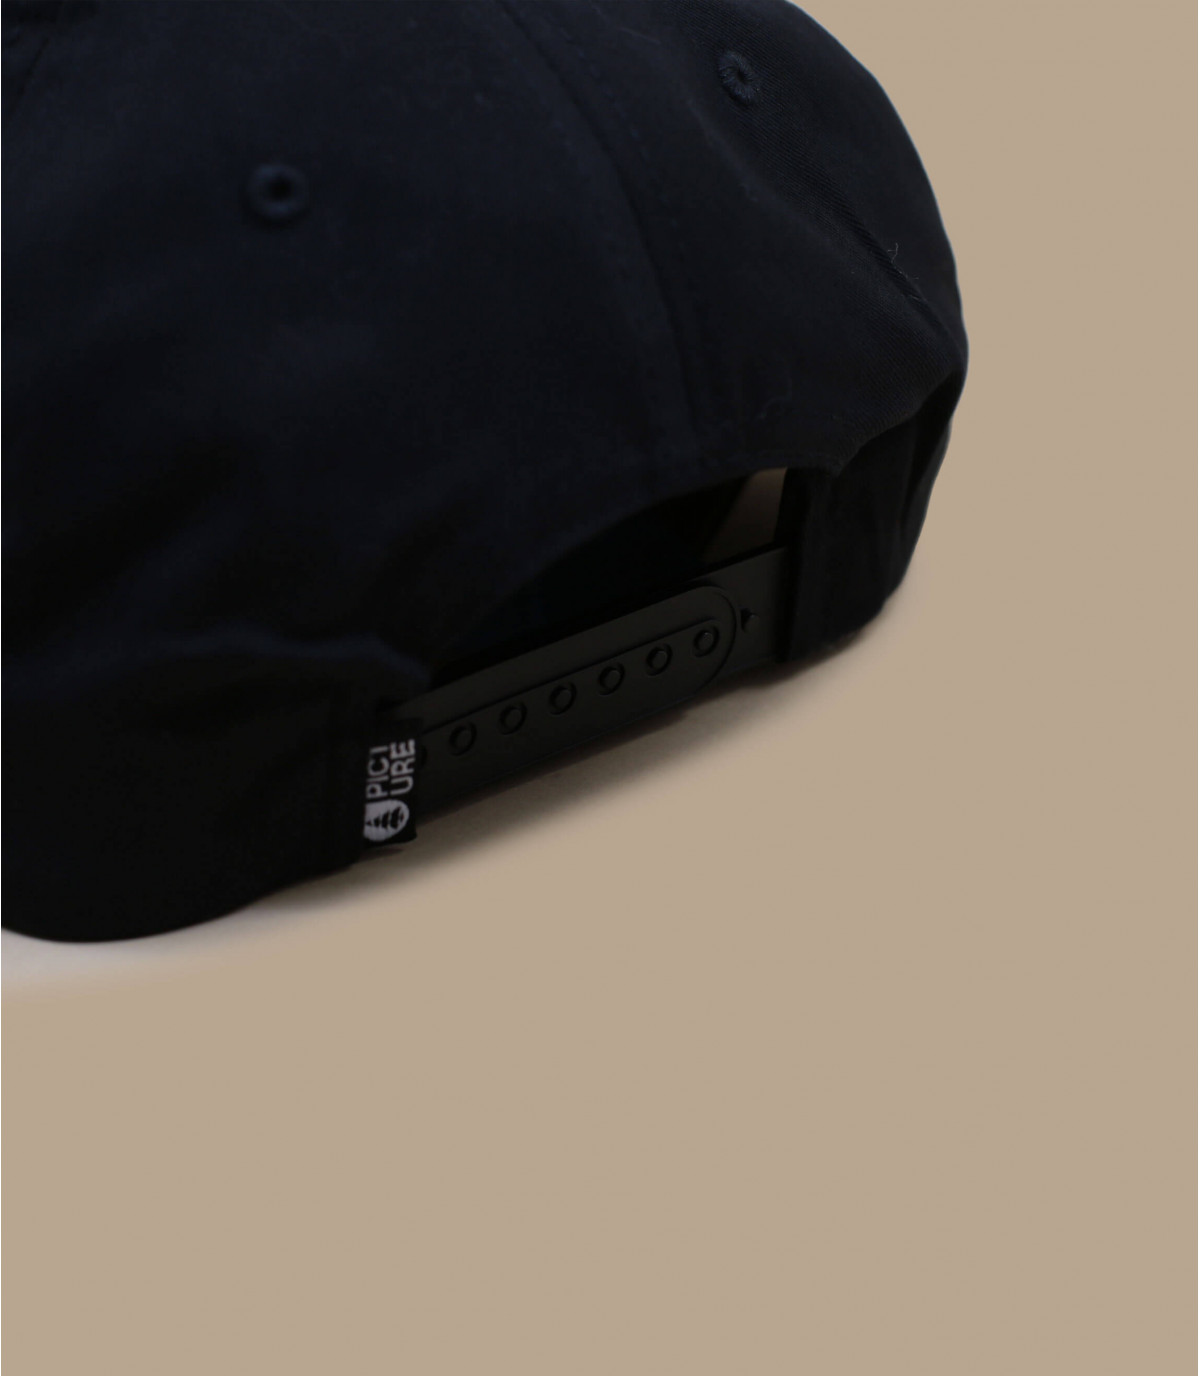 Détails Narrow Snapback black - image 4